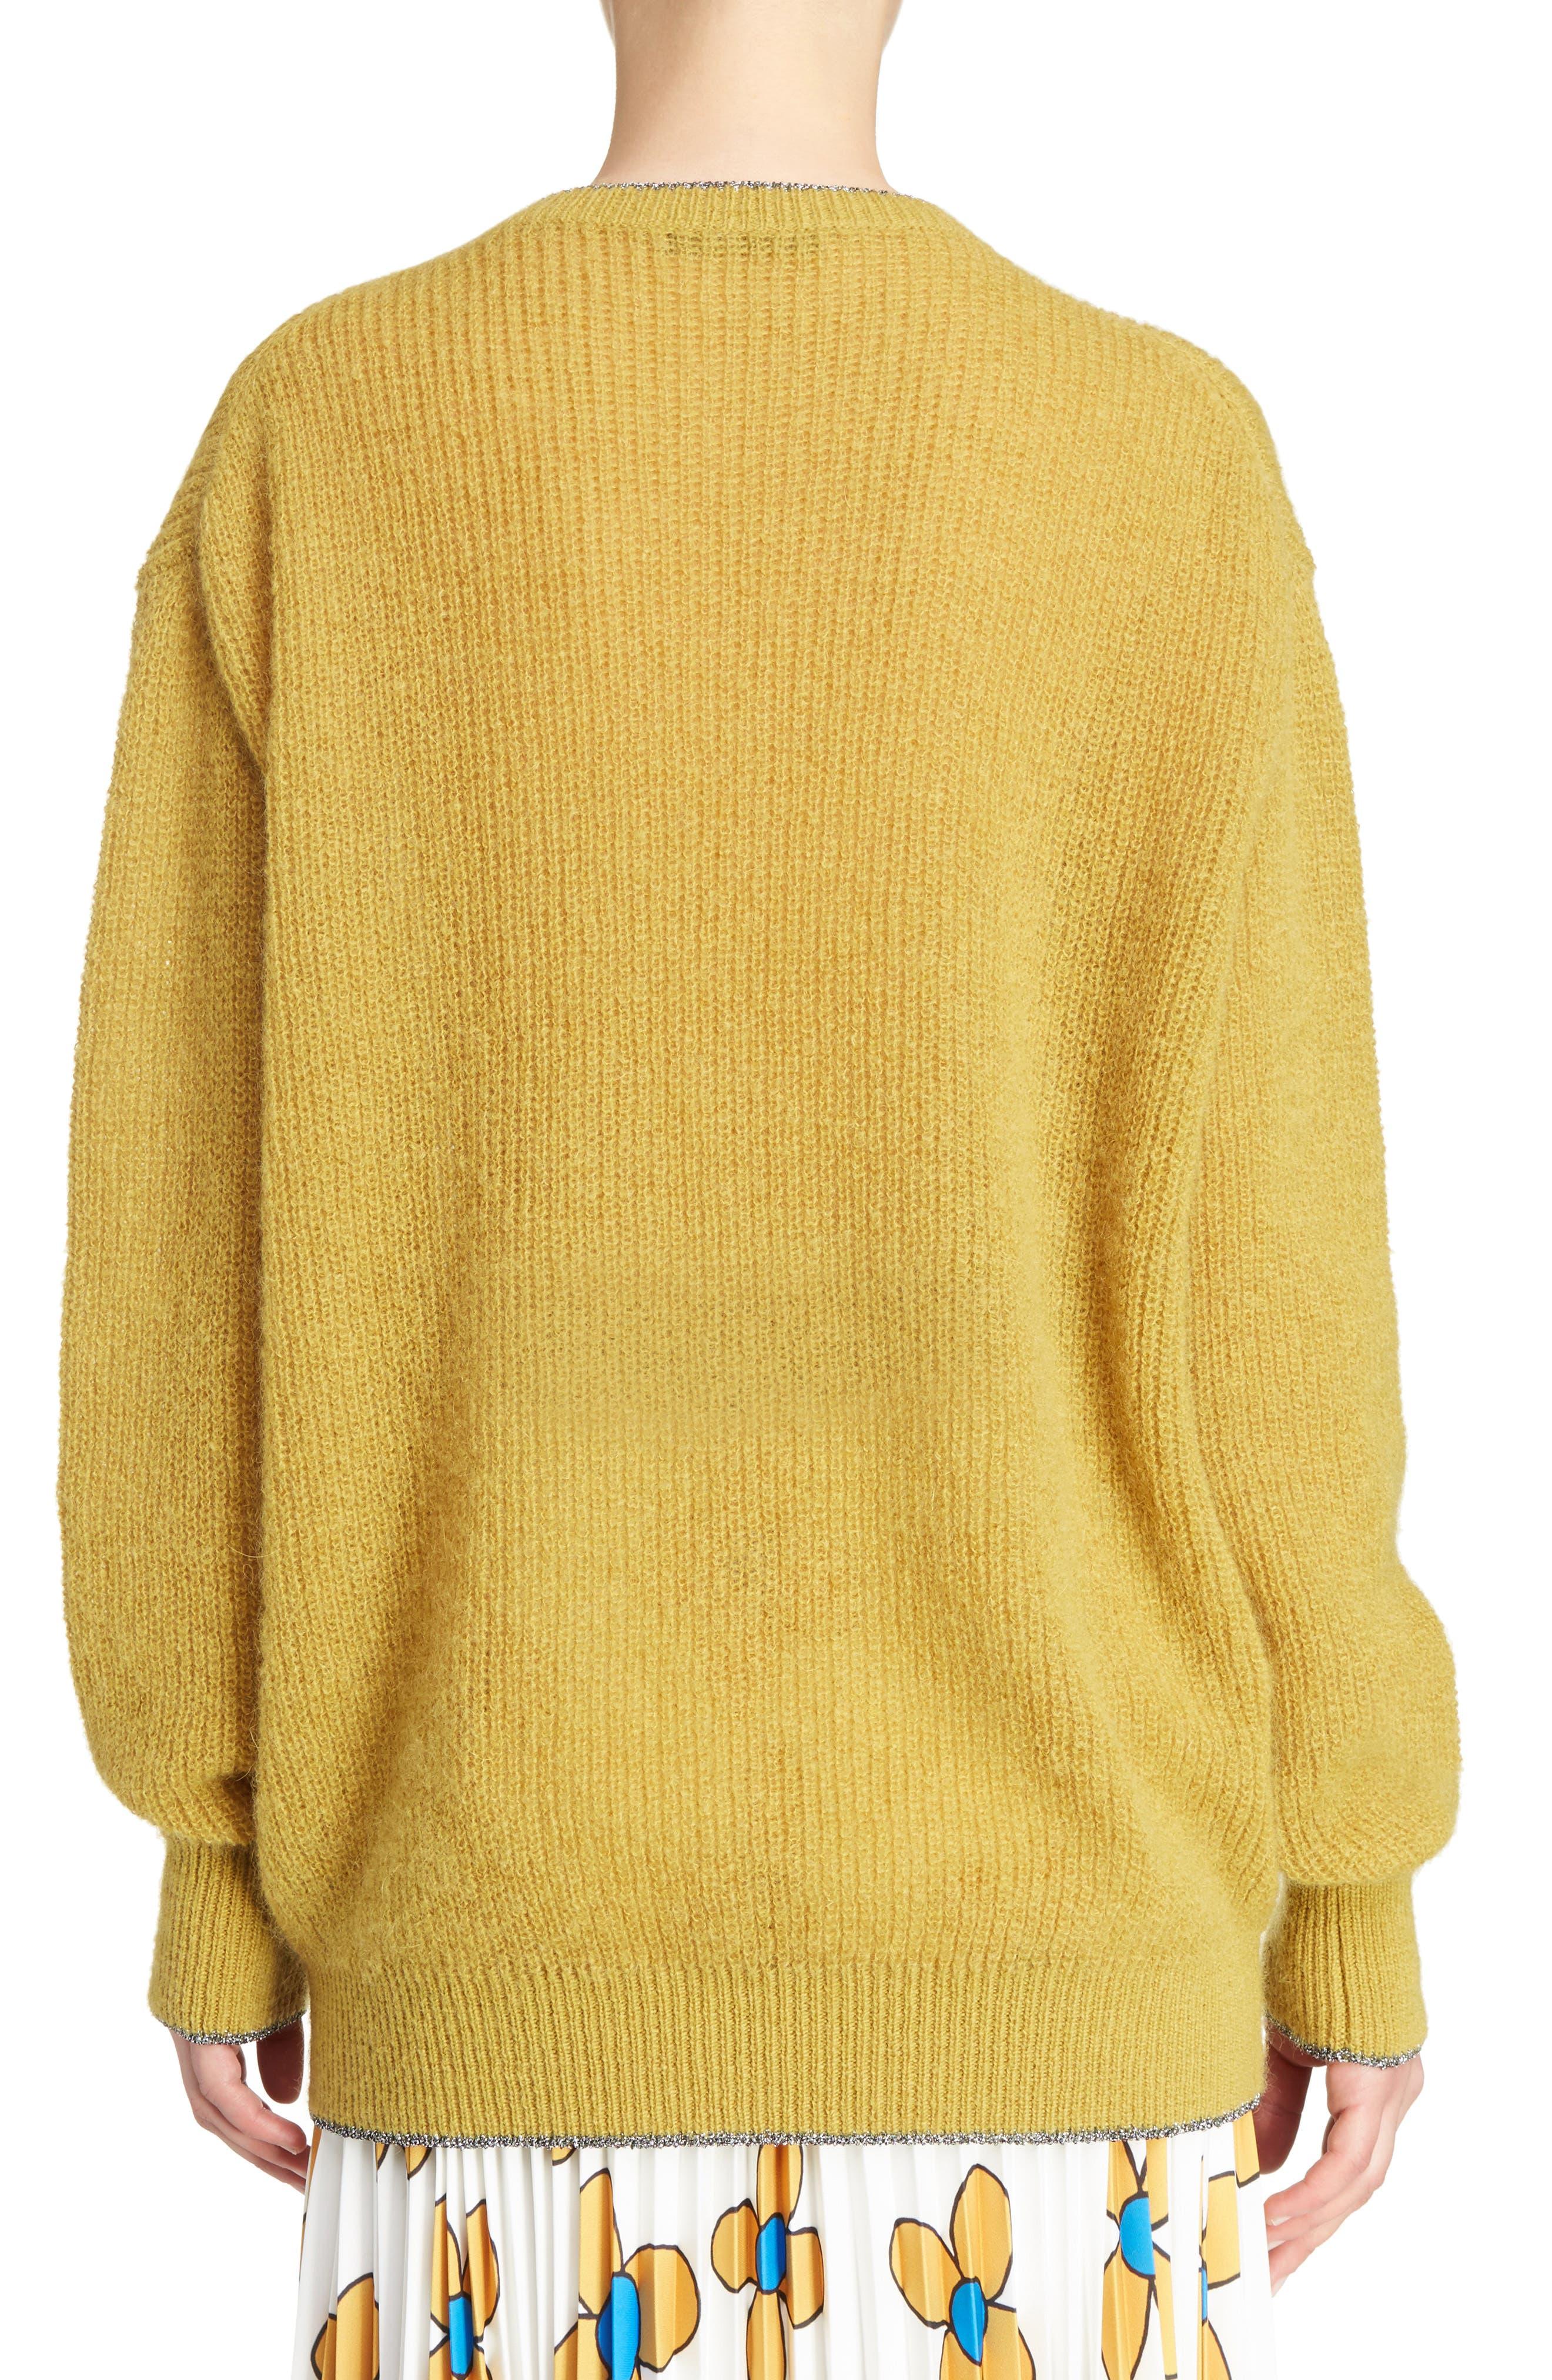 Crewneck Sweater,                             Alternate thumbnail 2, color,                             Honey/Silver